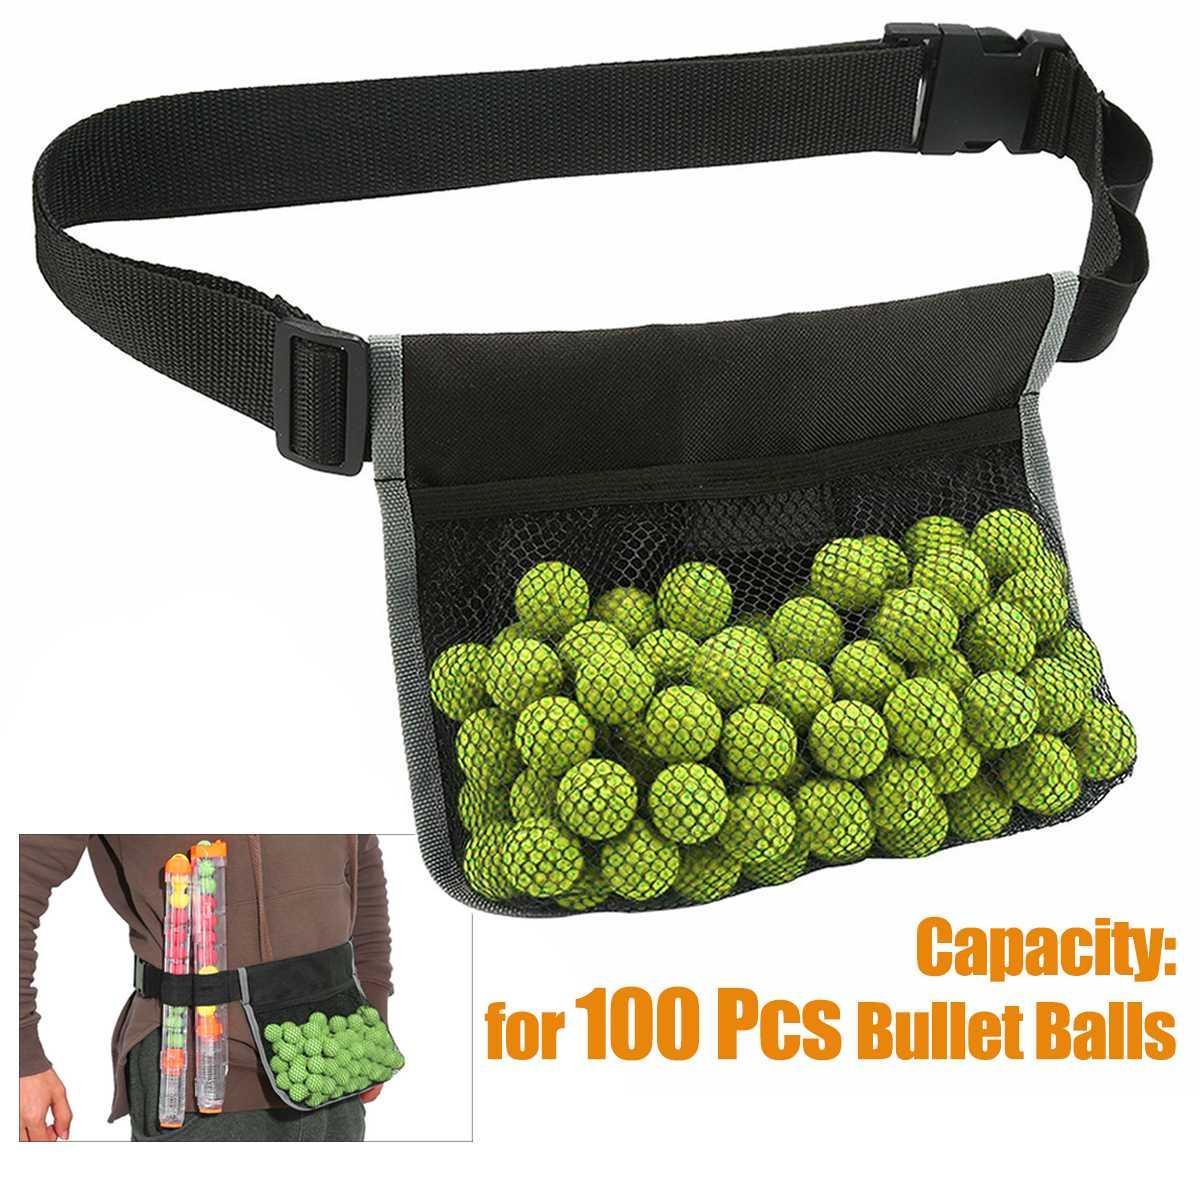 Adjustable Nylon Bullet Balls Waist Bag Storage Bag For Nerf Rival Apollo Zeus 100 Pcs Capacity